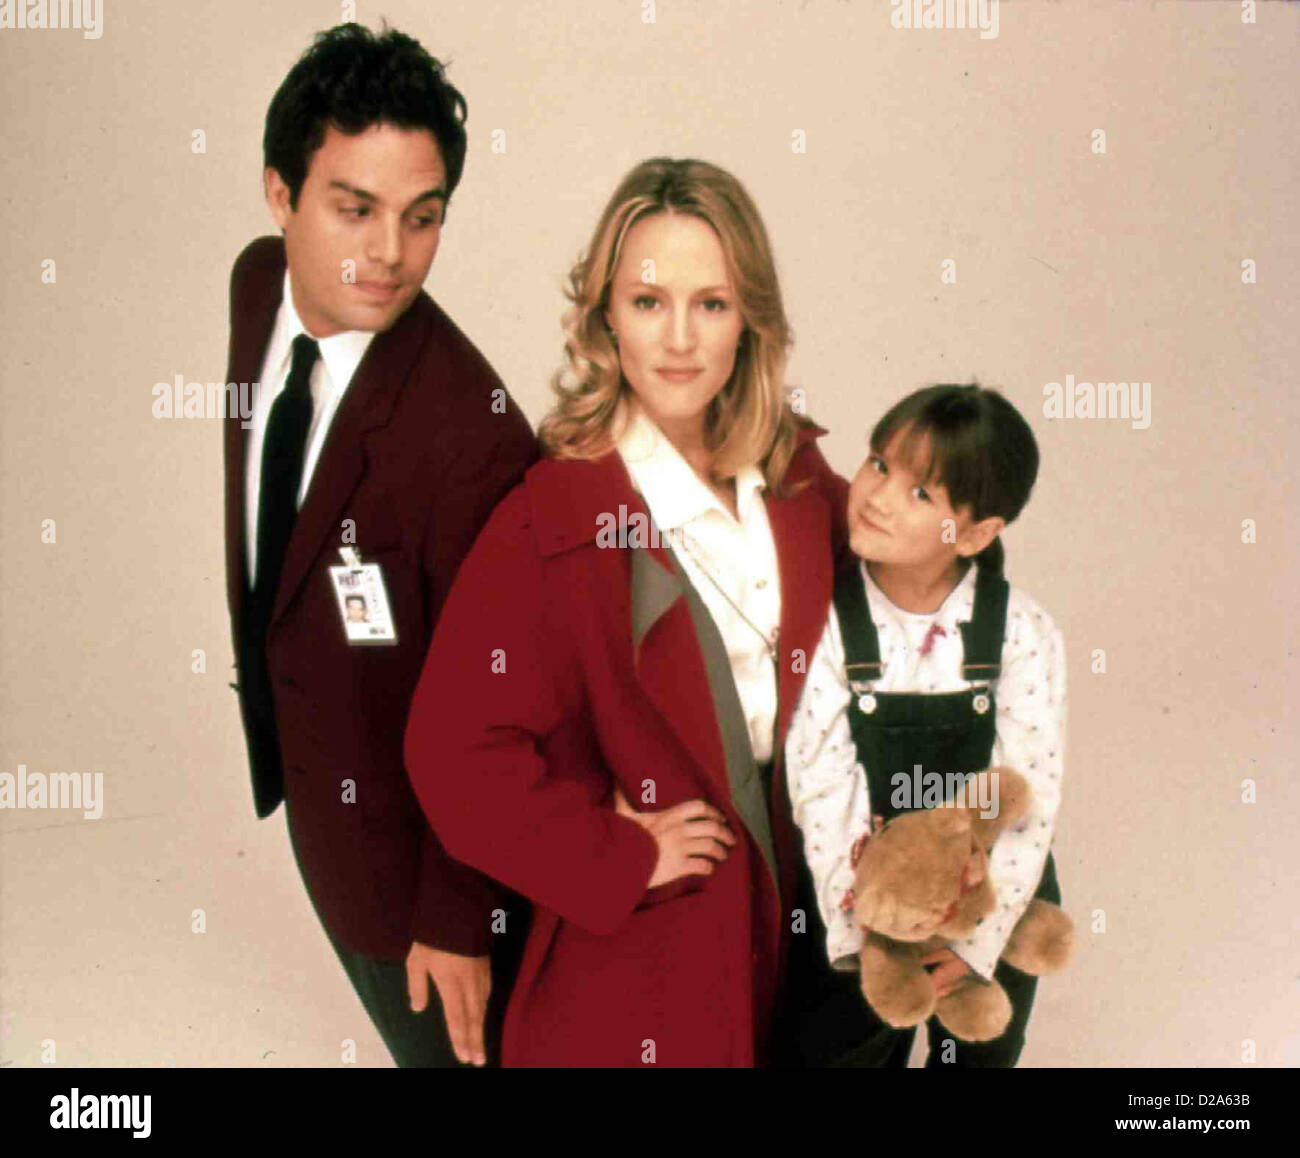 Am Zweiten Weihnachtstag  On 2nd Day Christmas  Mark Ruffalo, Mary Stuart Masterson, Lauren Suzanne Pratt *** Local Stock Photo